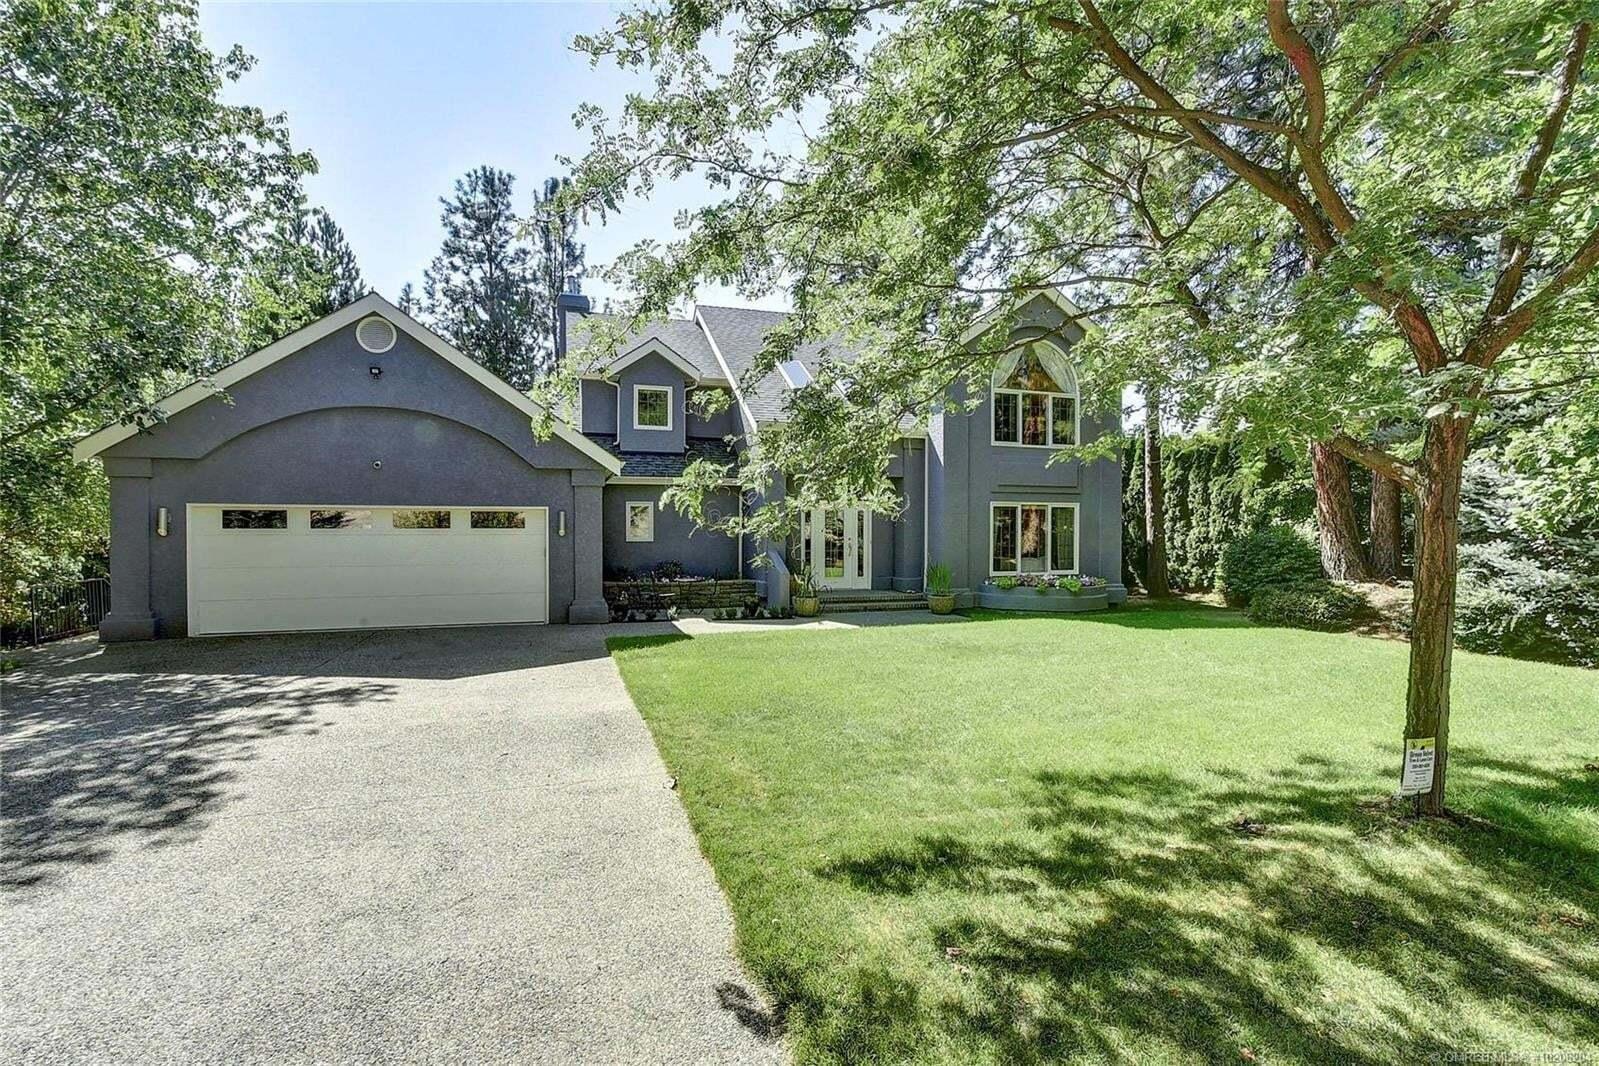 House for sale at 3926 Hyak Rd Kelowna British Columbia - MLS: 10208204